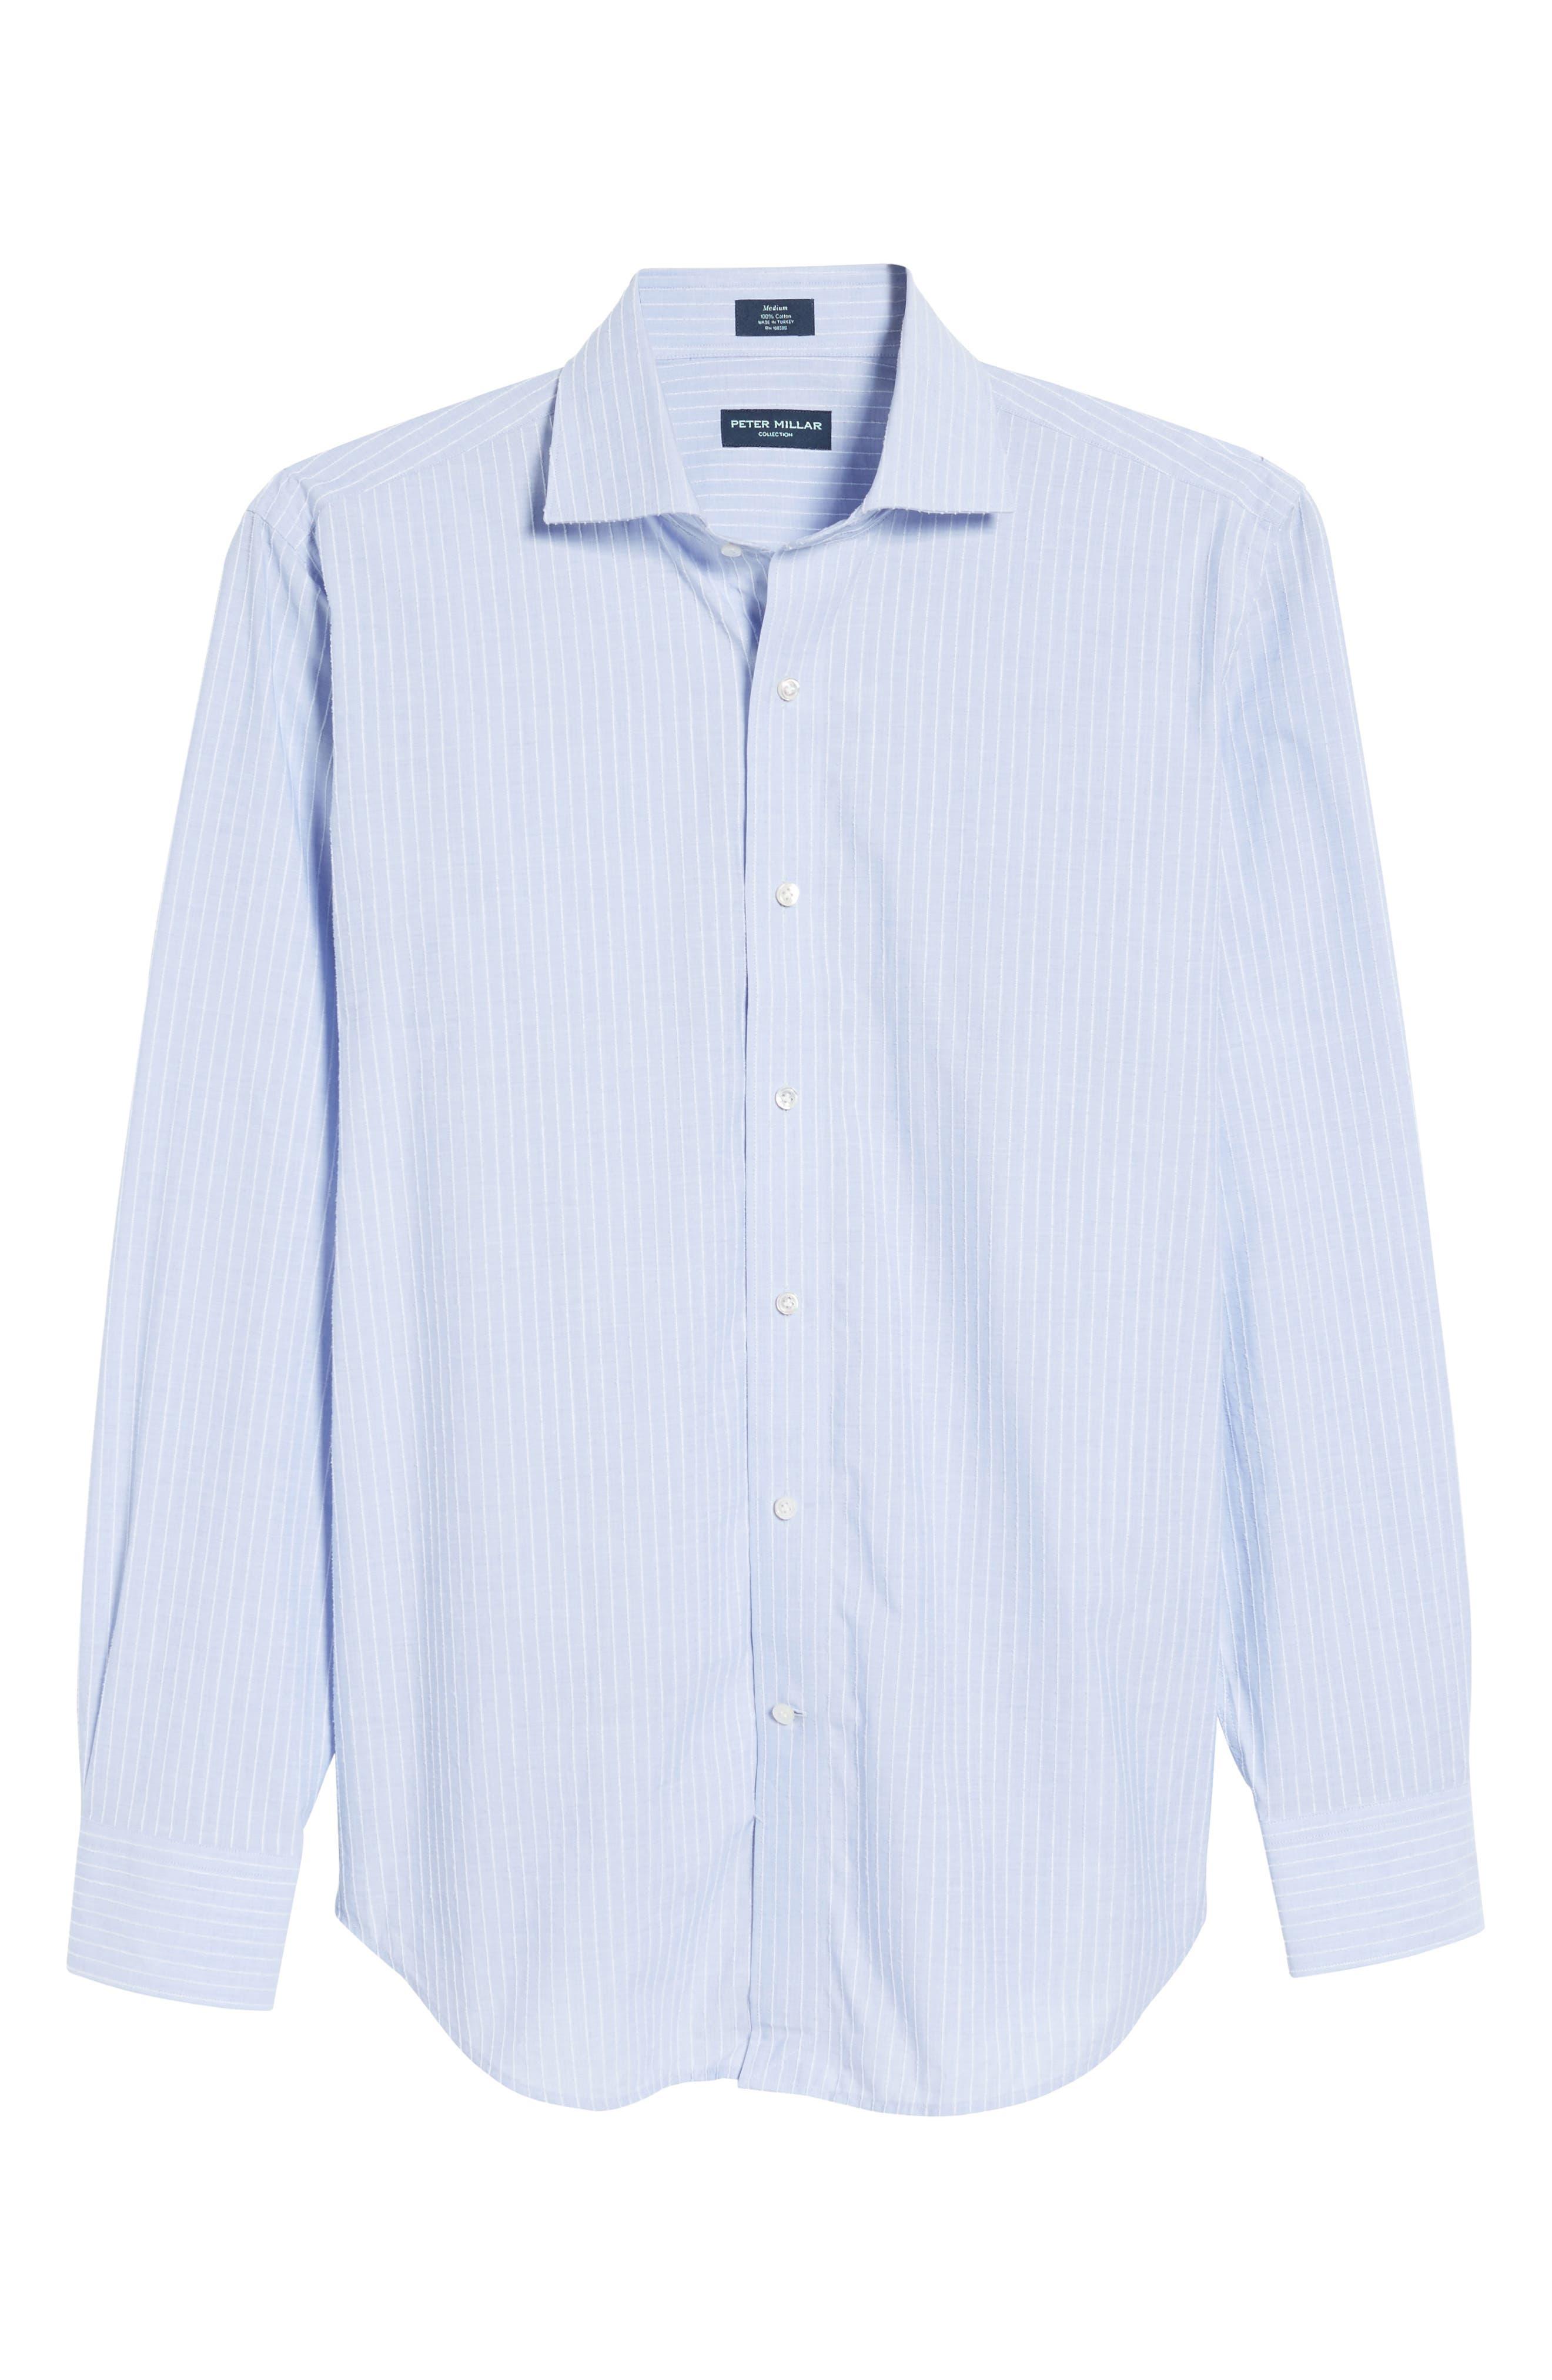 Cejar Stripe Sport Shirt,                             Alternate thumbnail 6, color,                             433